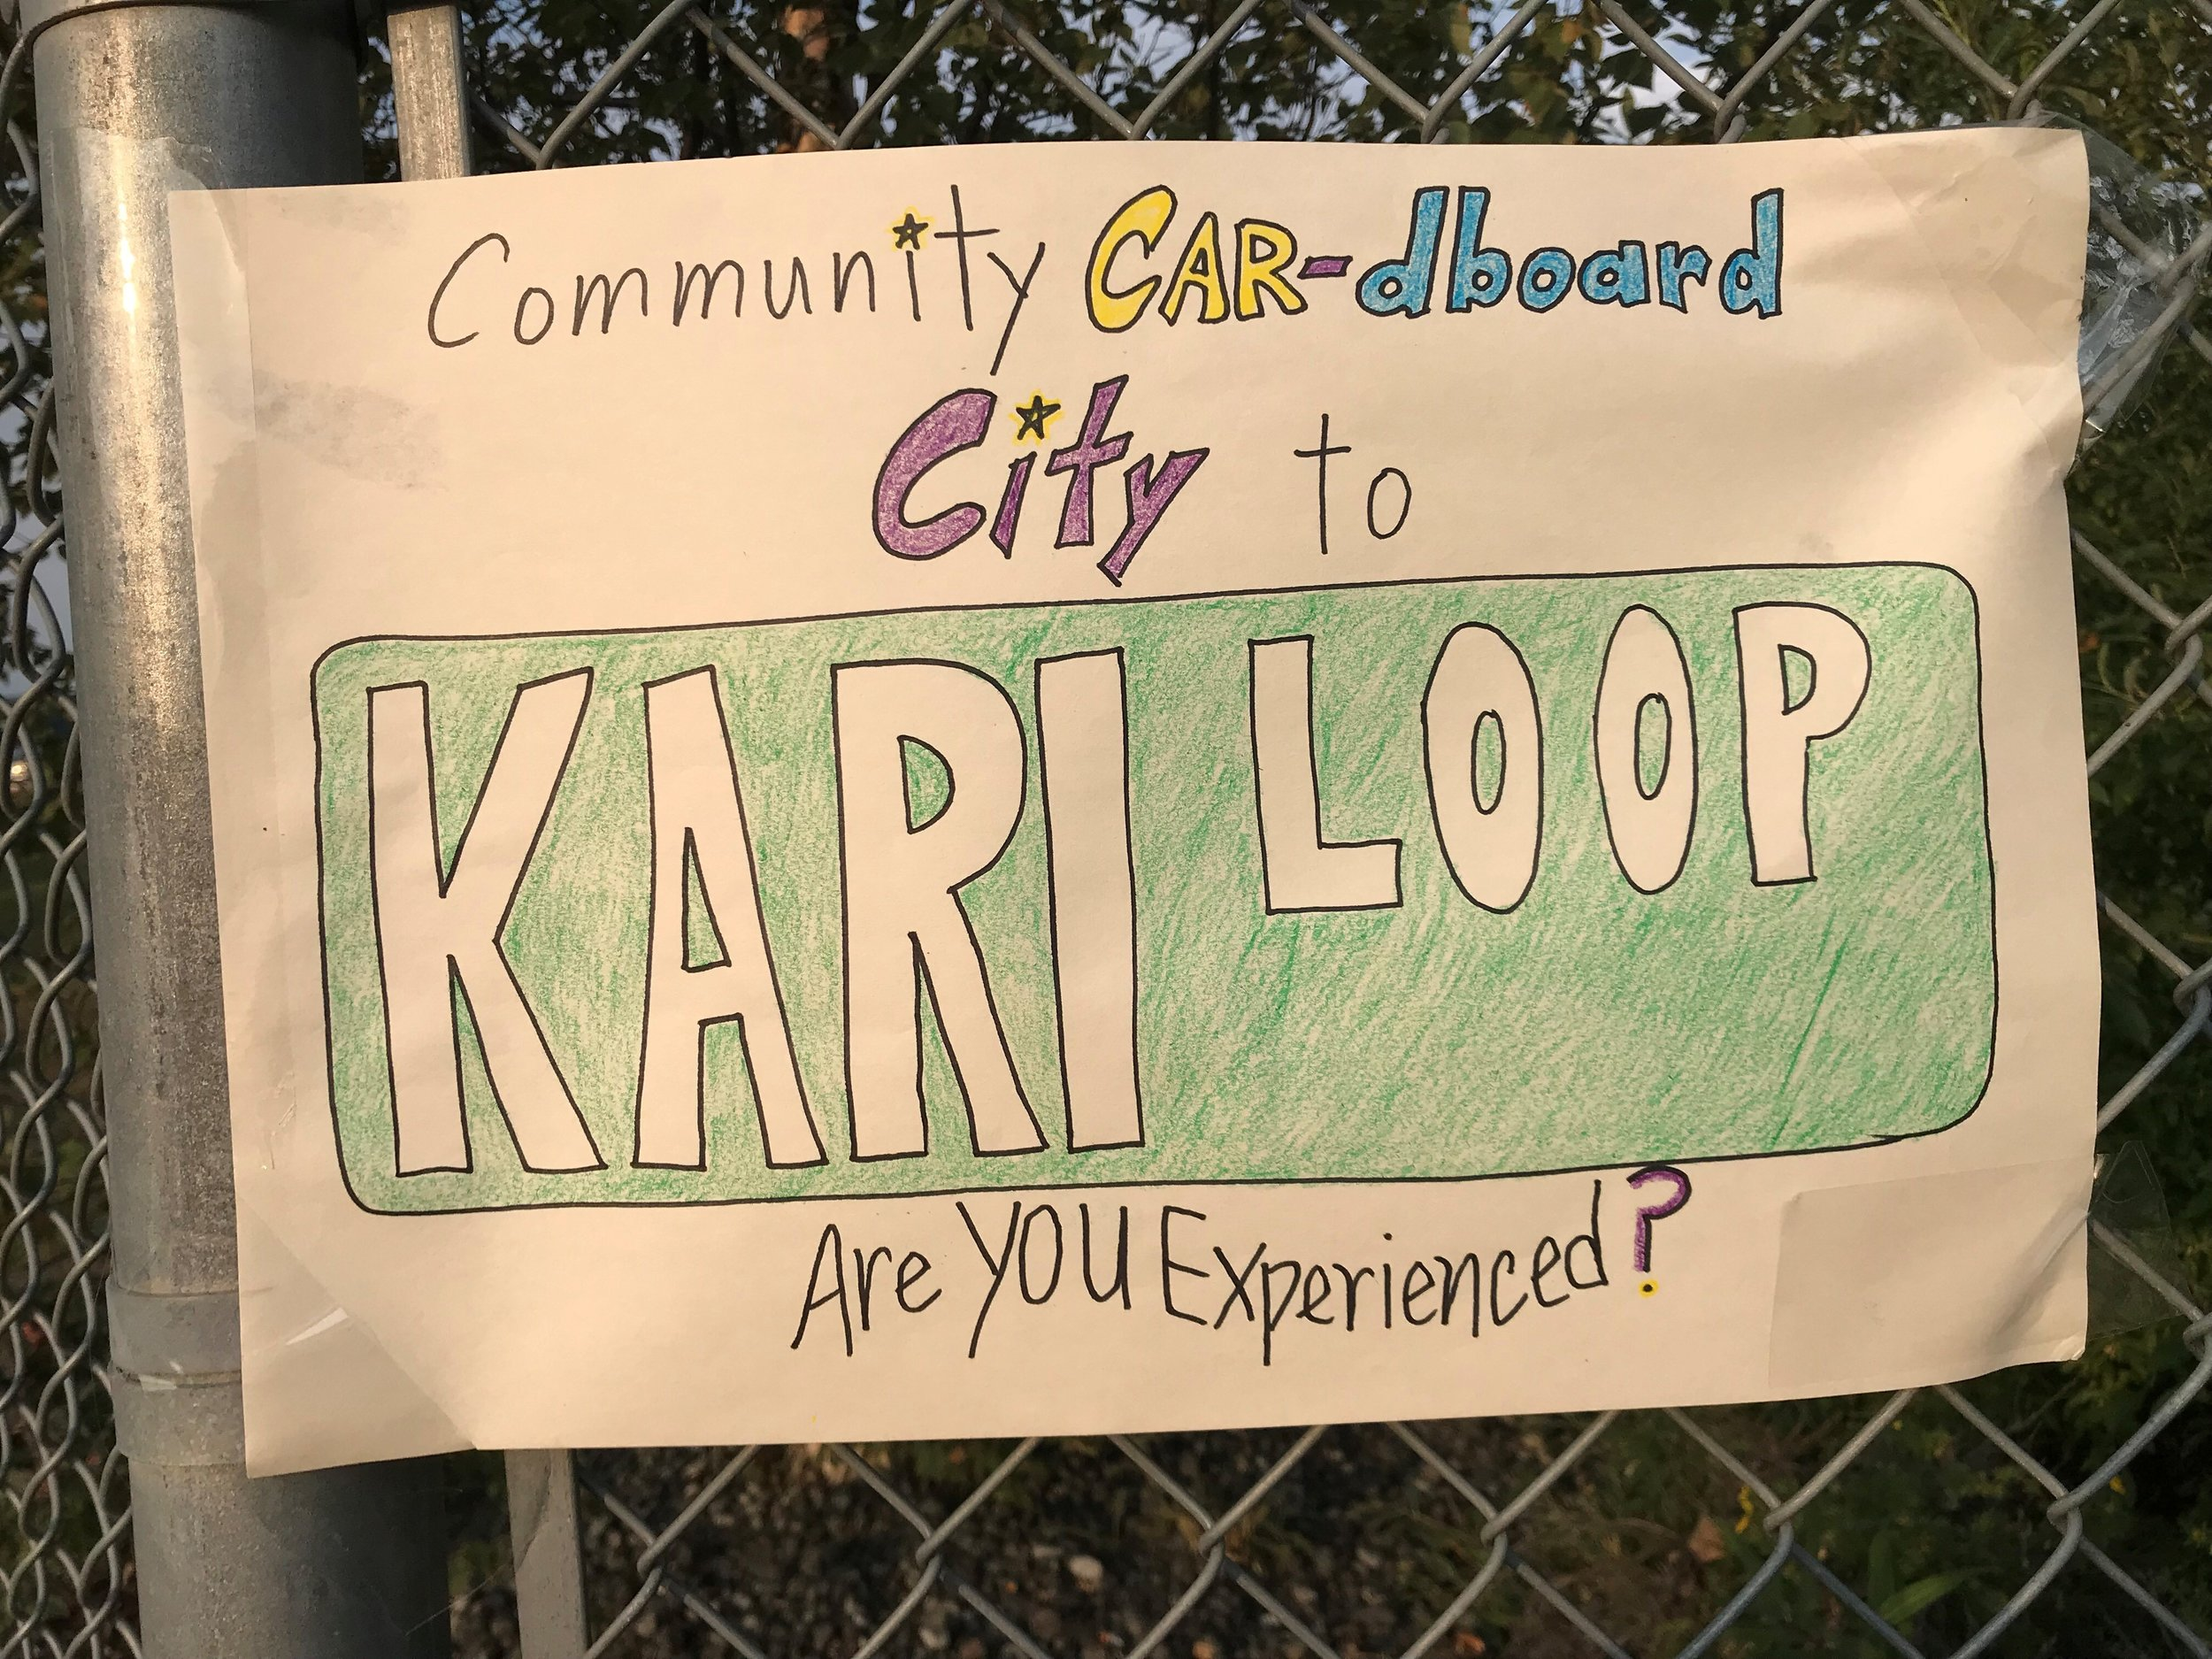 COMMUNITY - Cardboard City 2019 (1).jpg